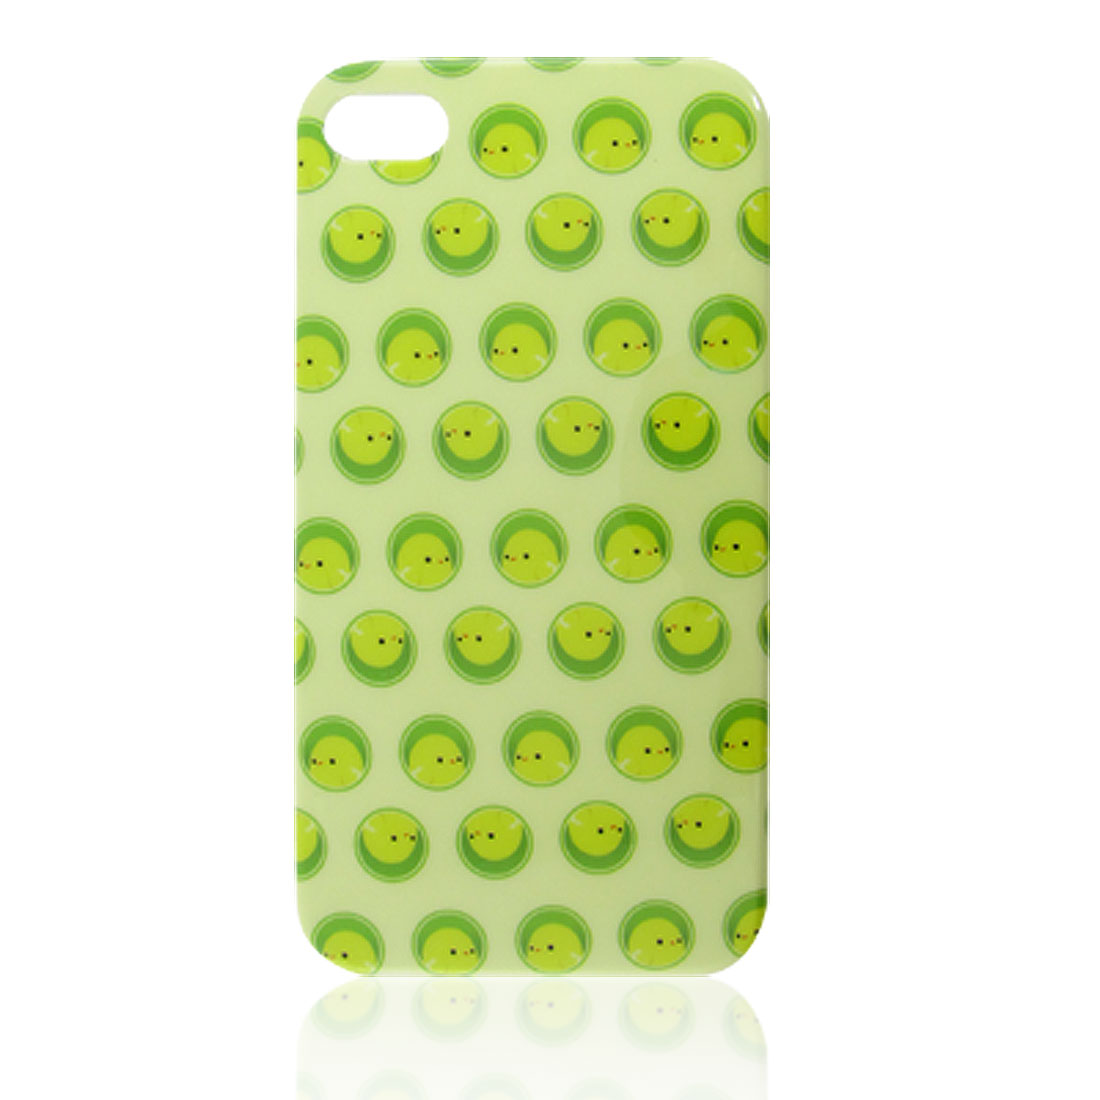 Light Green Little Duck Pattern IMD Back Cover for iPhone 4 4G 4S